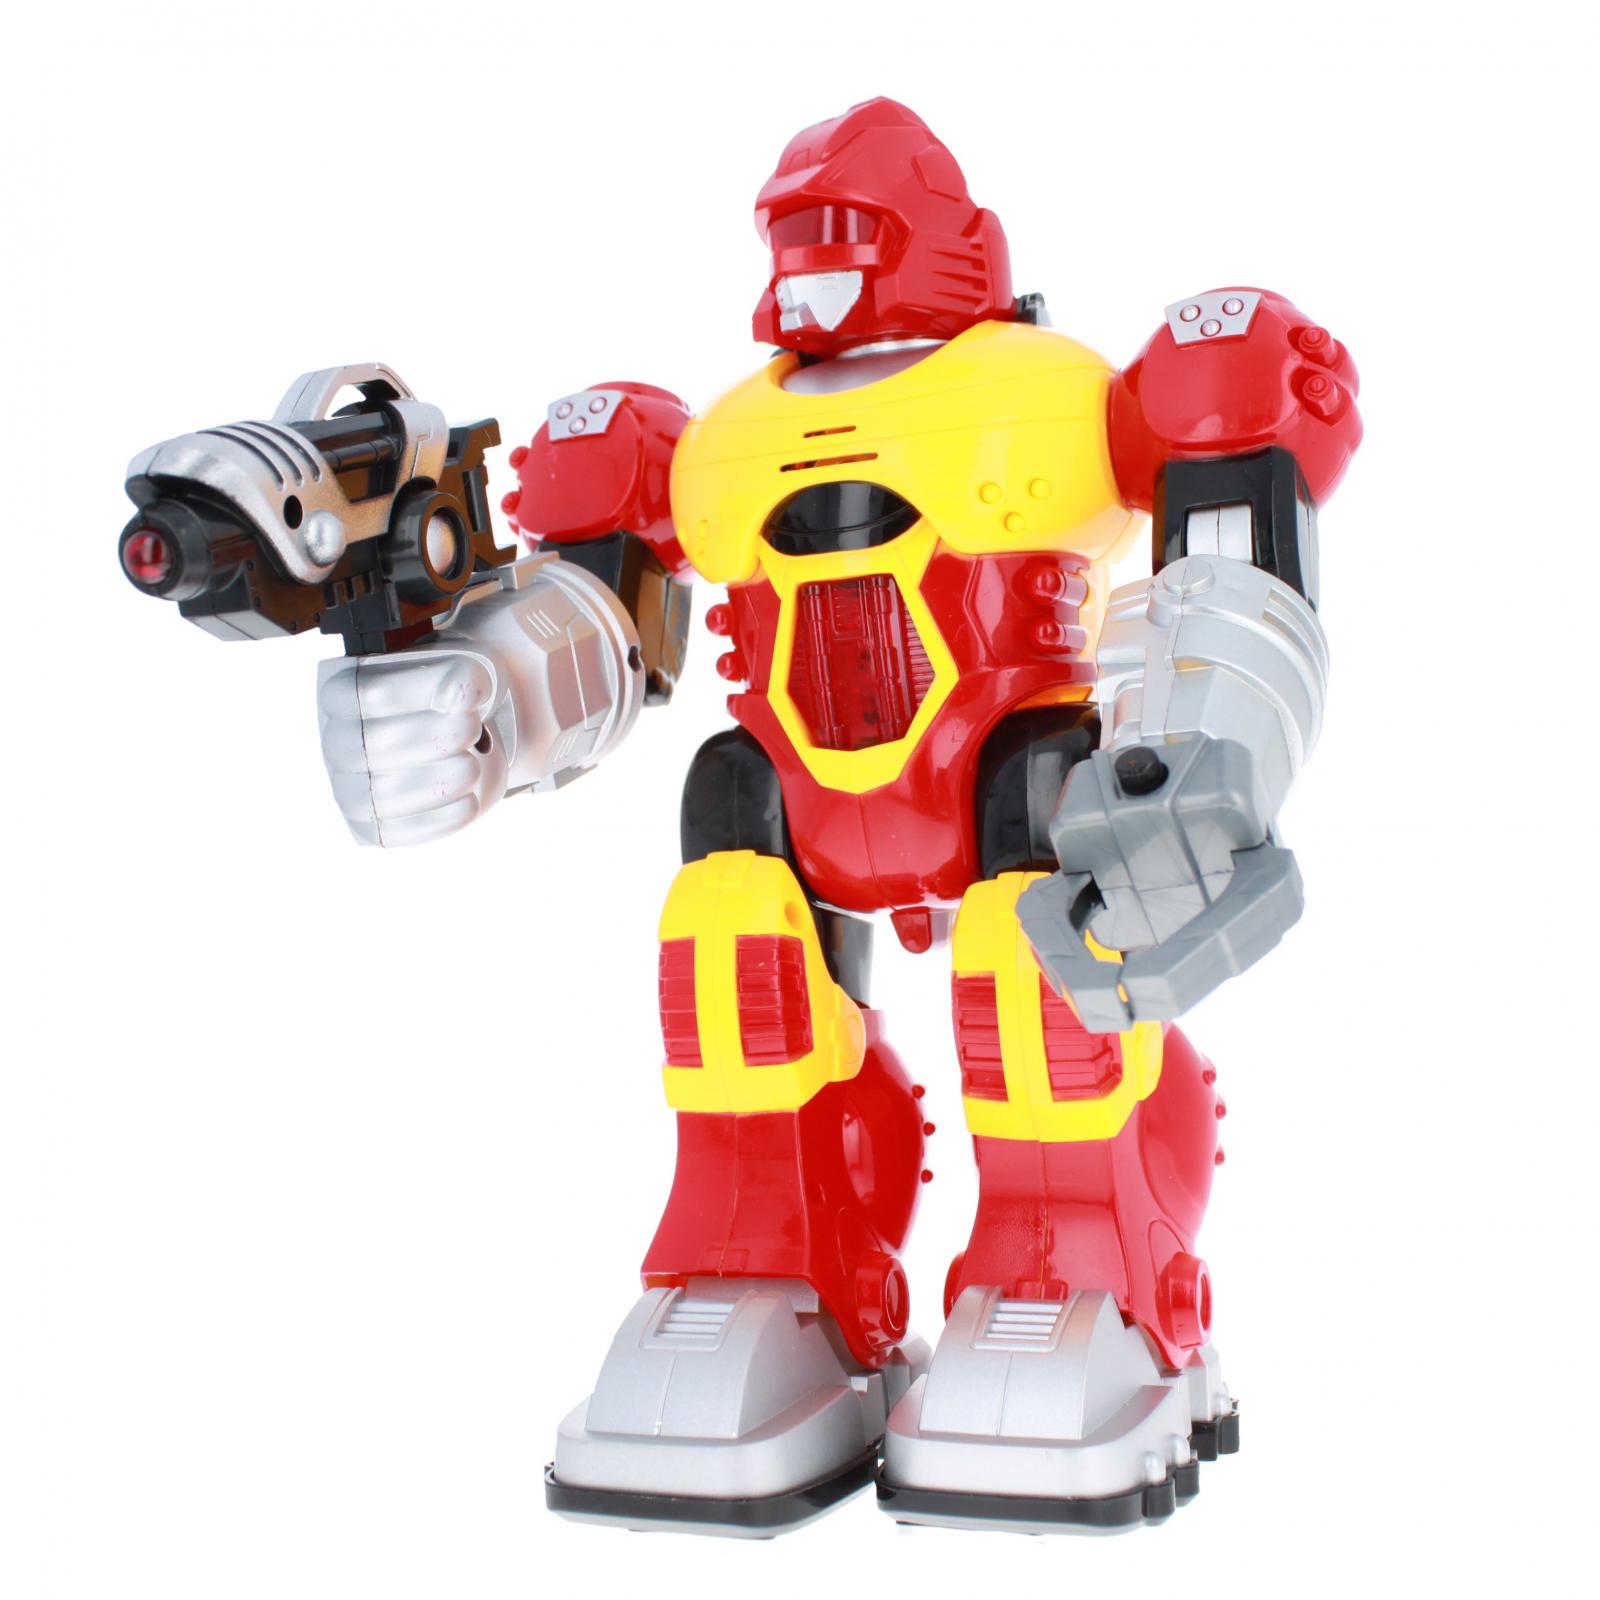 Power Warrior Light Up Super Robot Action Figure - Red